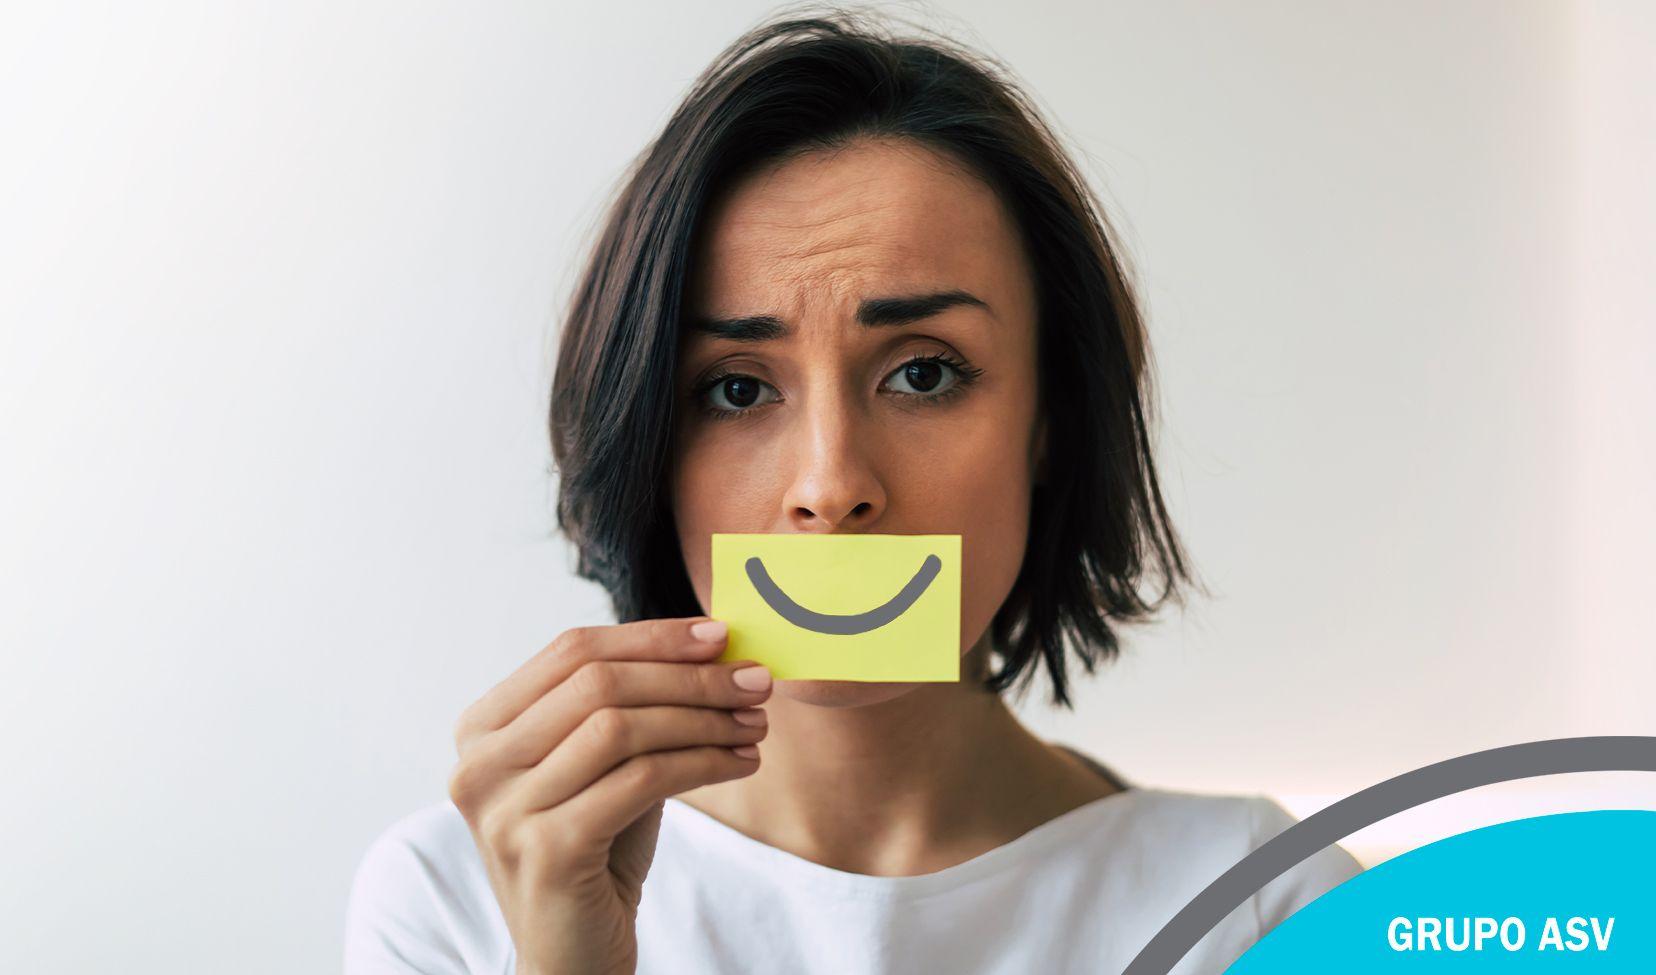 Reacciones inapropiadas: la risa nerviosa